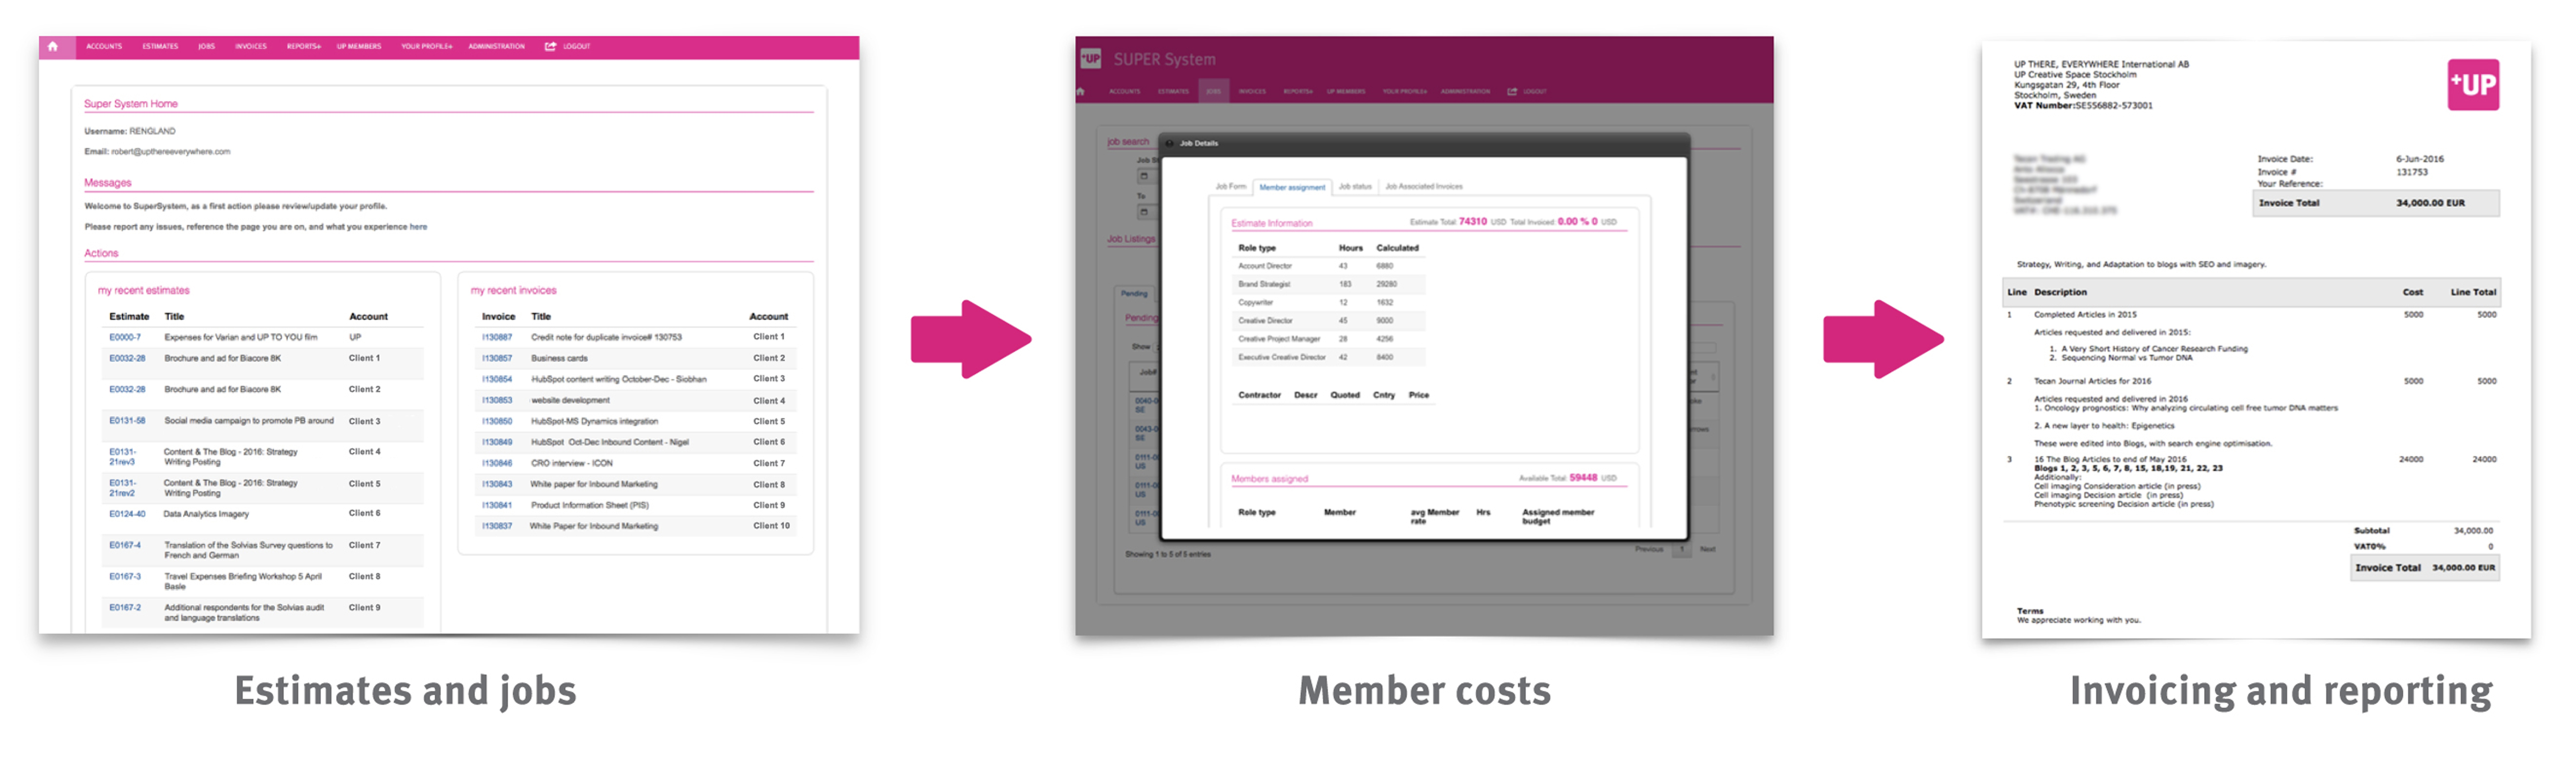 estimates_costs_reports